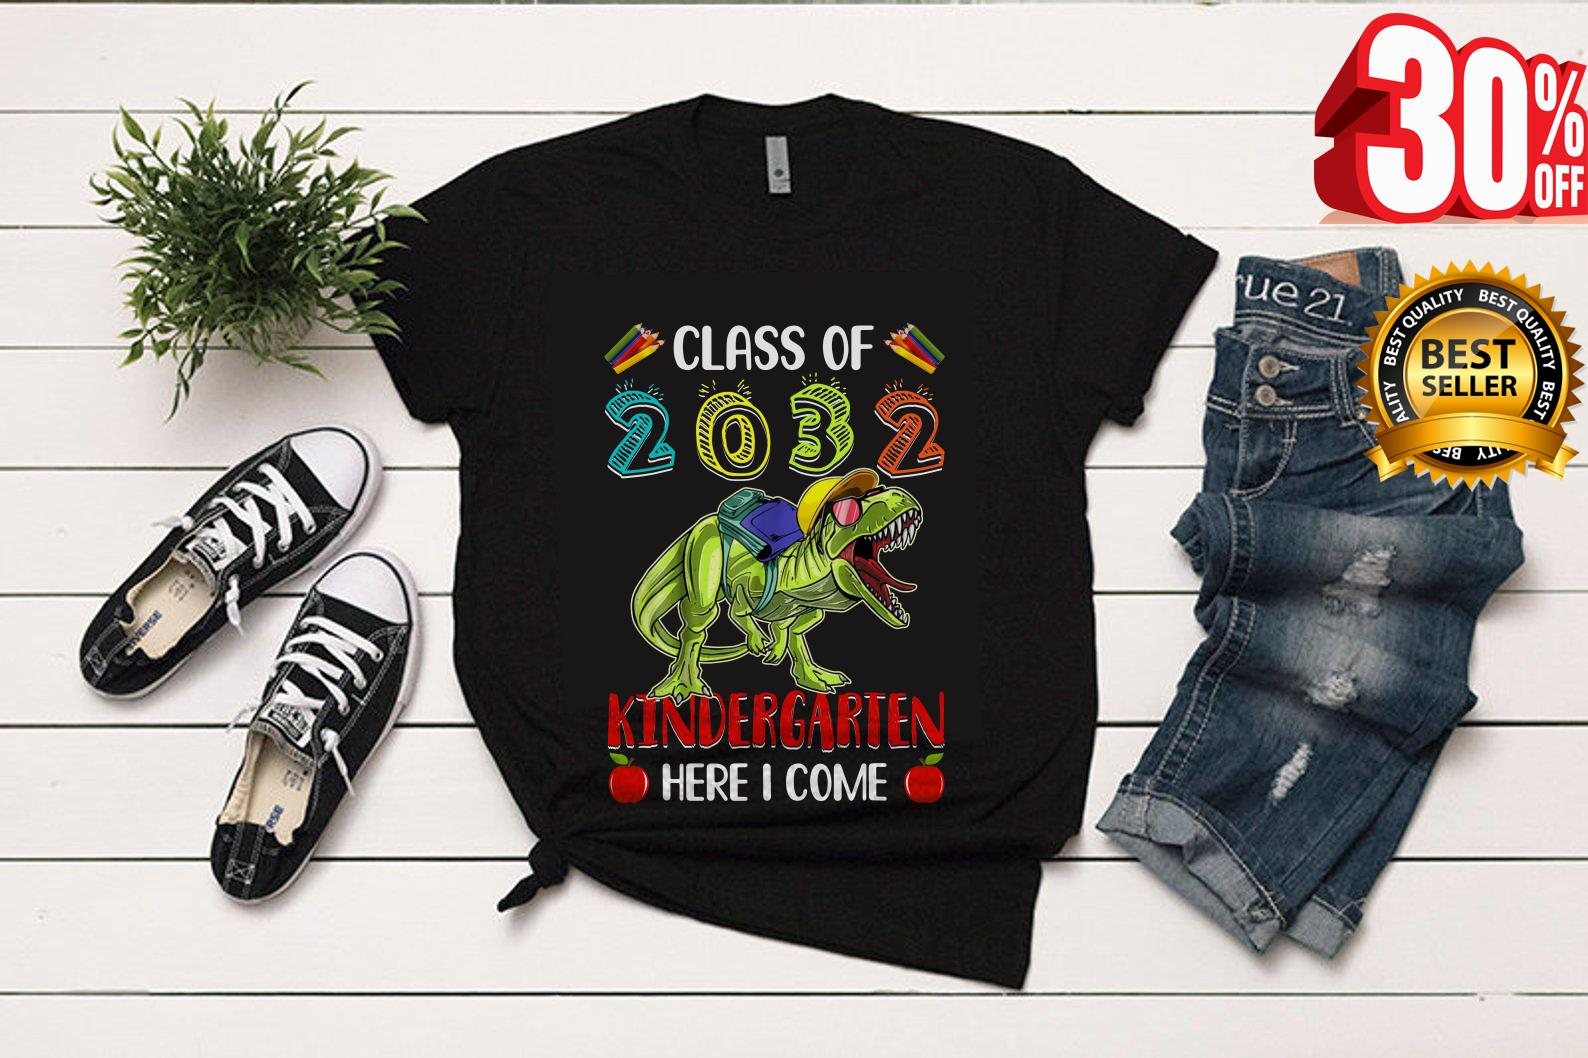 Trex class of 2032 kindergarten here i come shirt